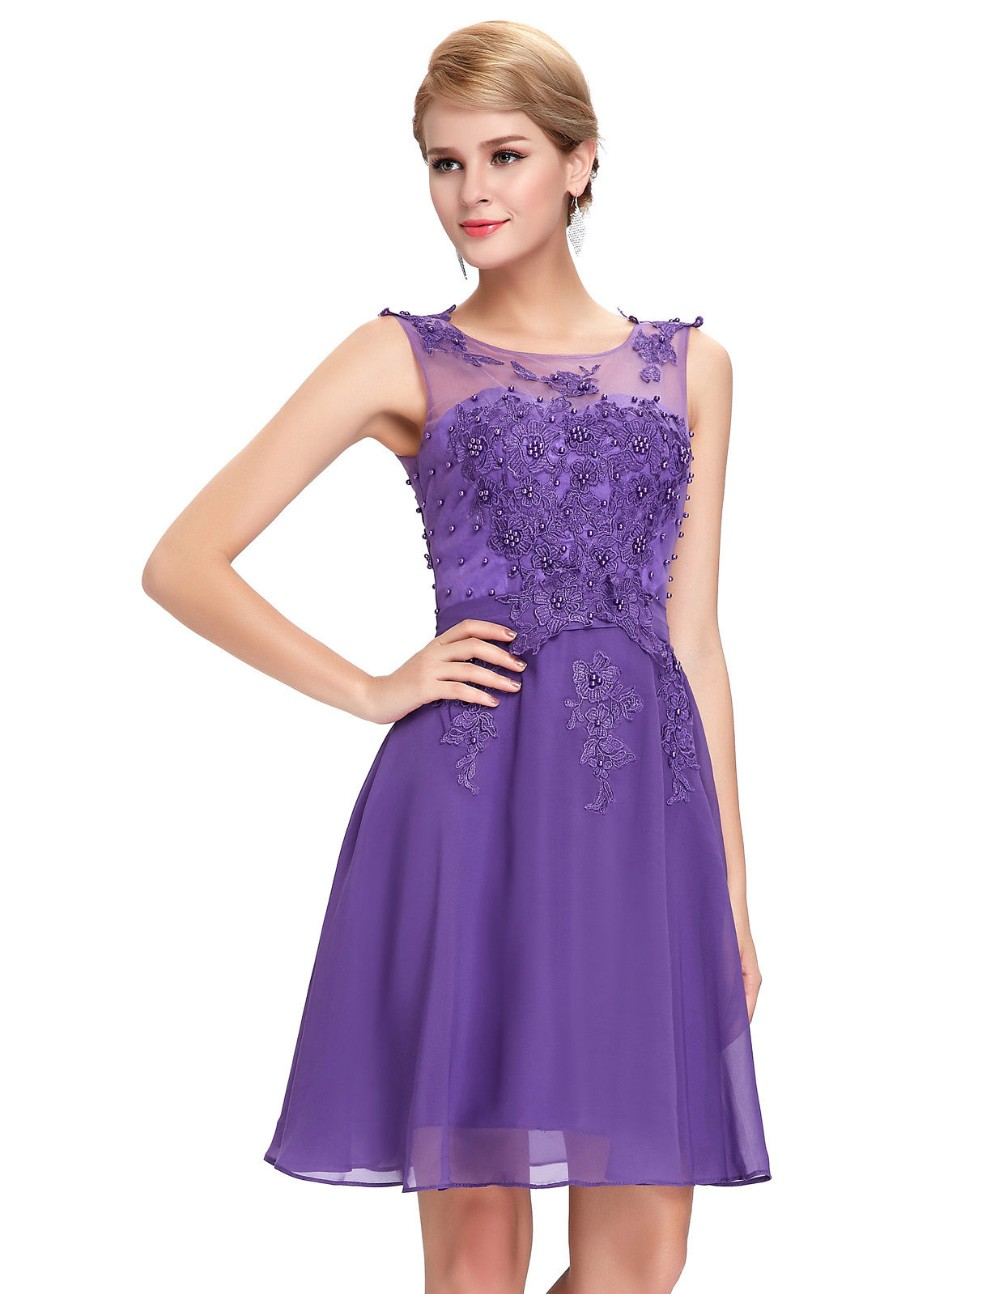 Grace karin vestidos de gasa corto de baile rosa púrpura negro verde ...